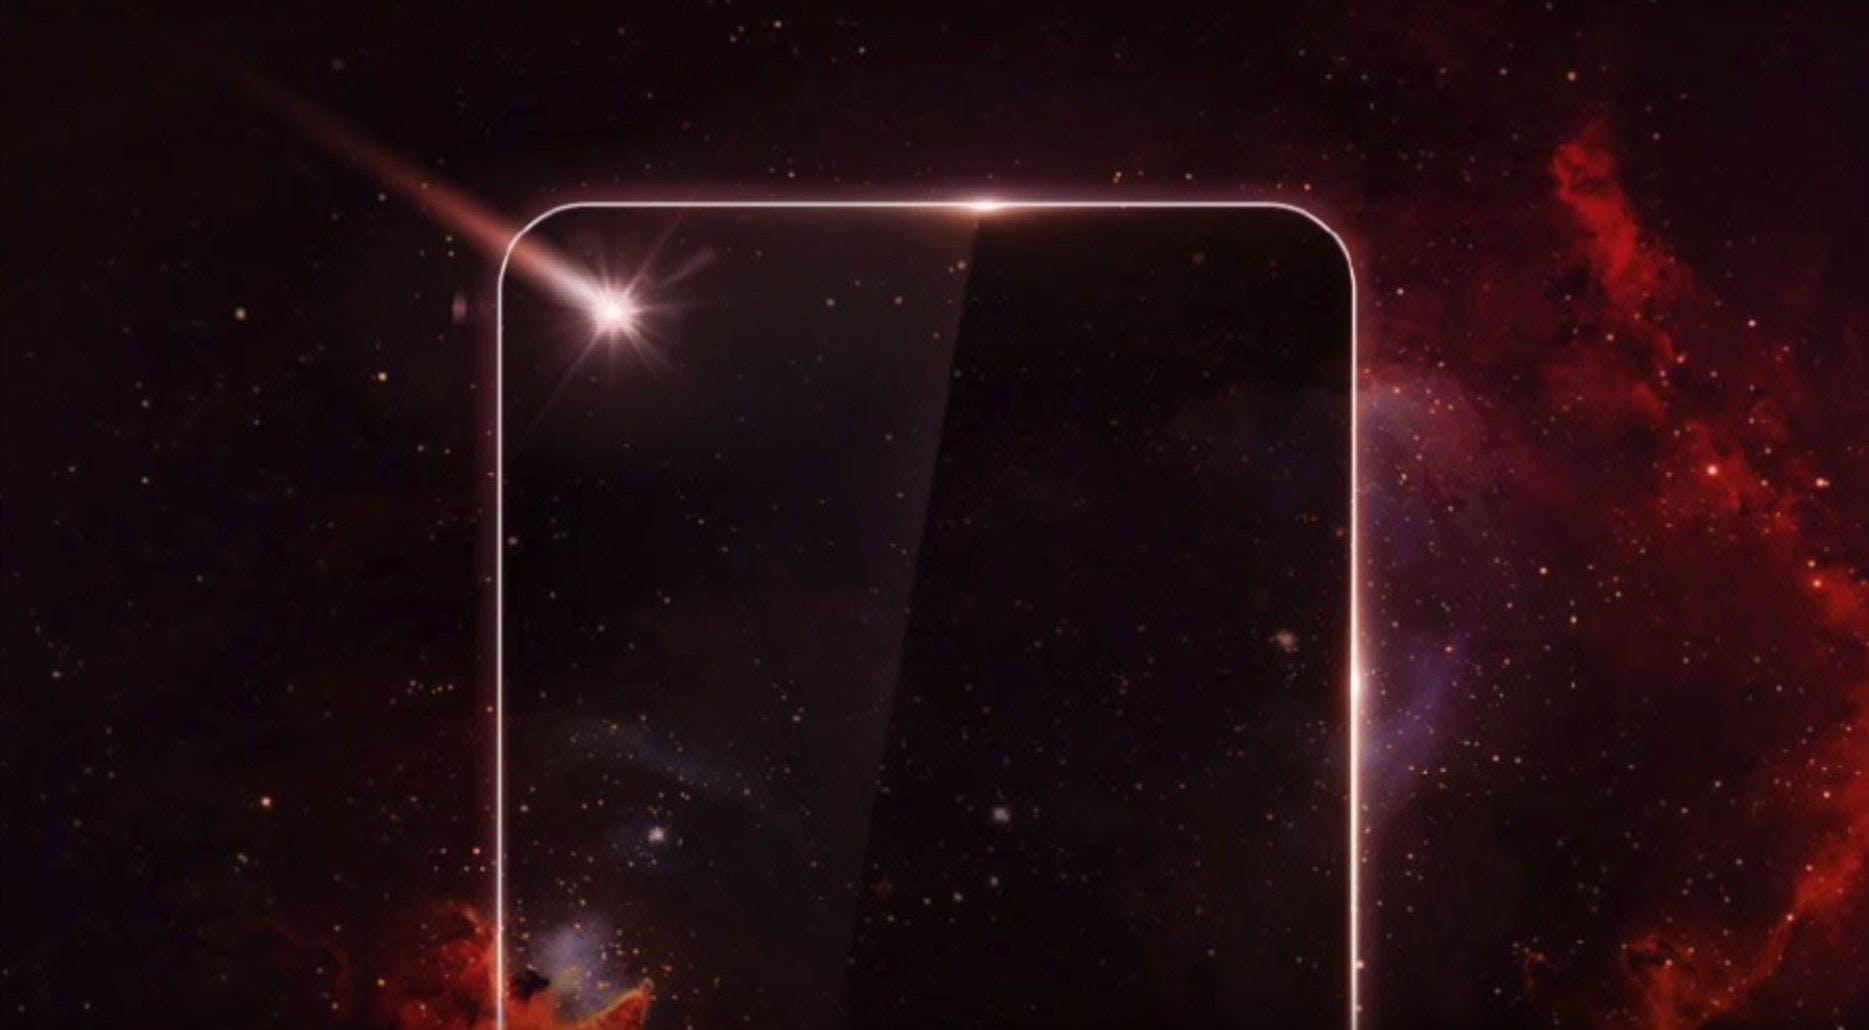 Huawei Nova 4 - Coming with In-Screen Selfie Camera